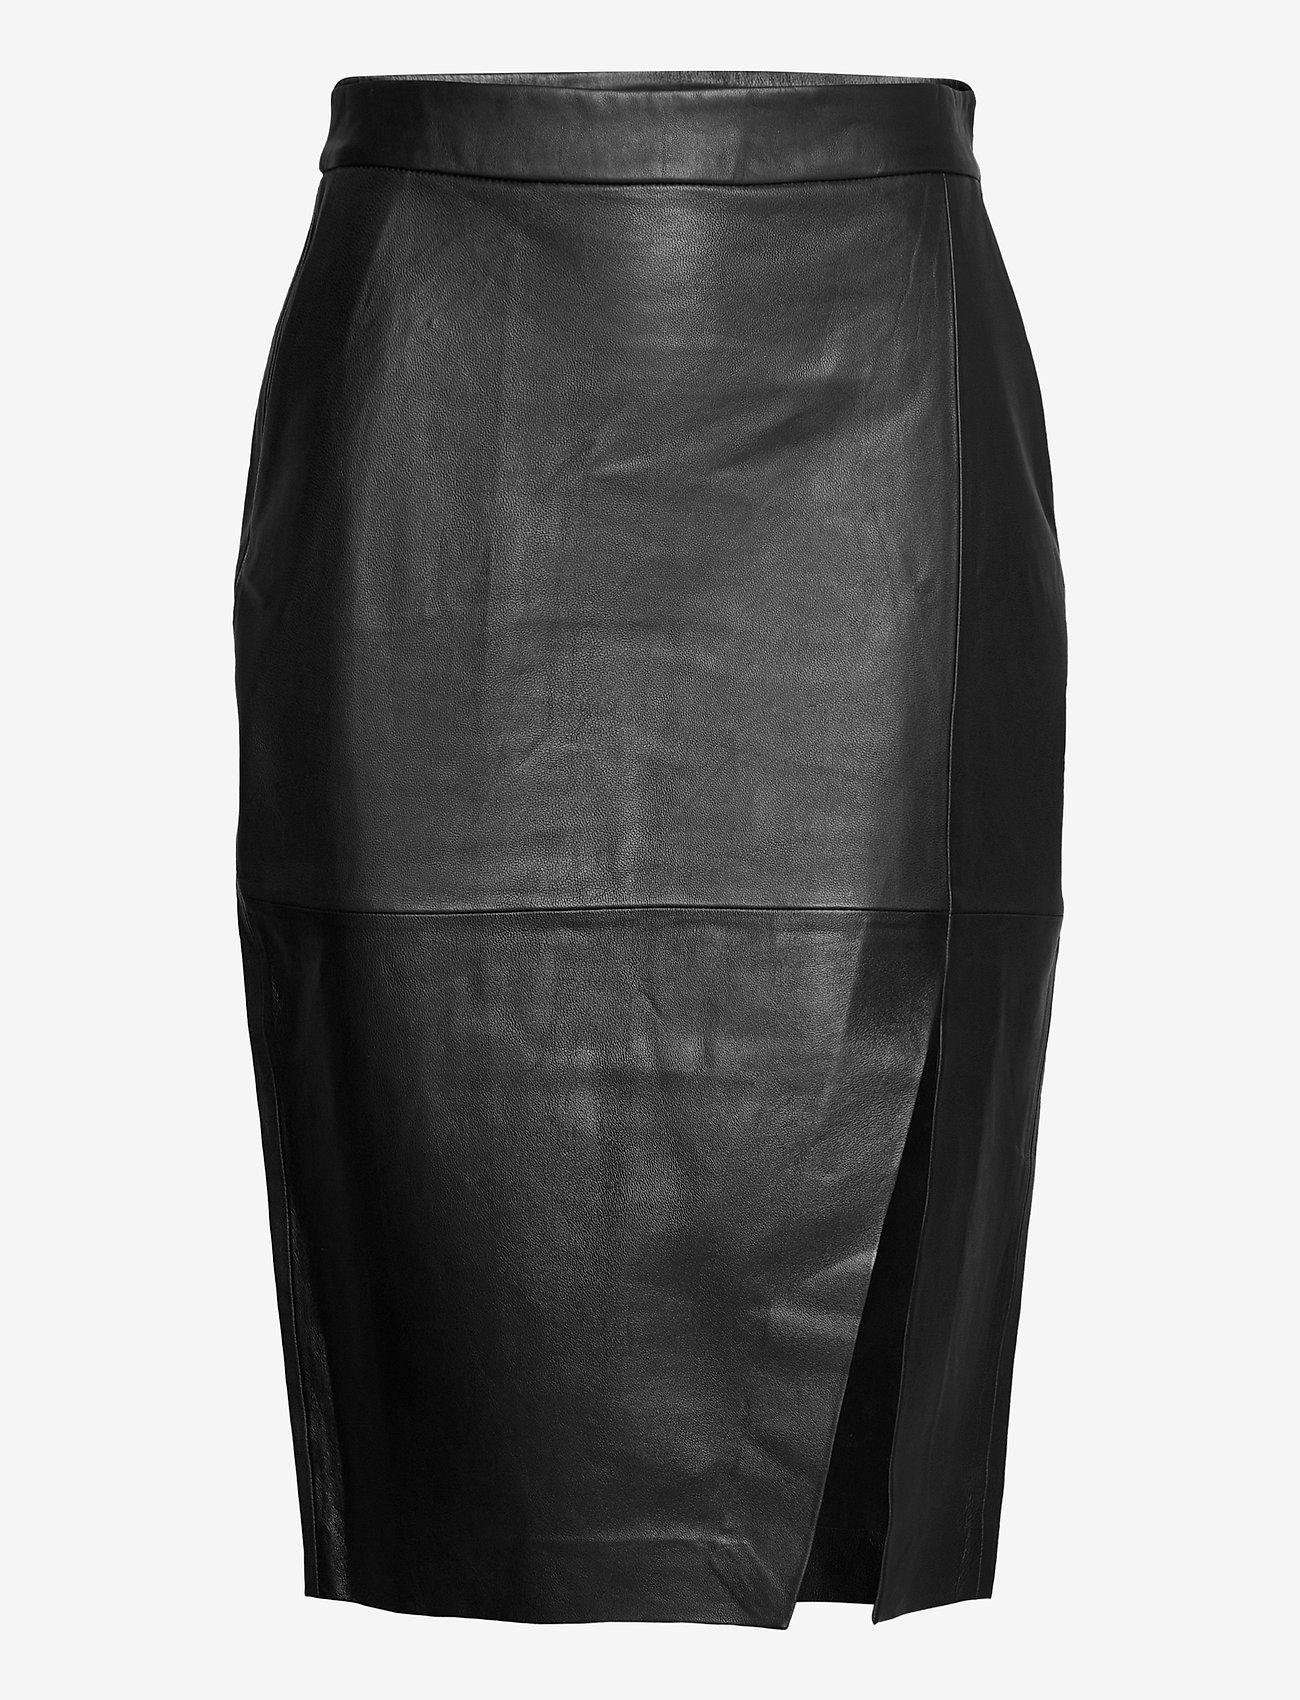 Thousand skirt day-3